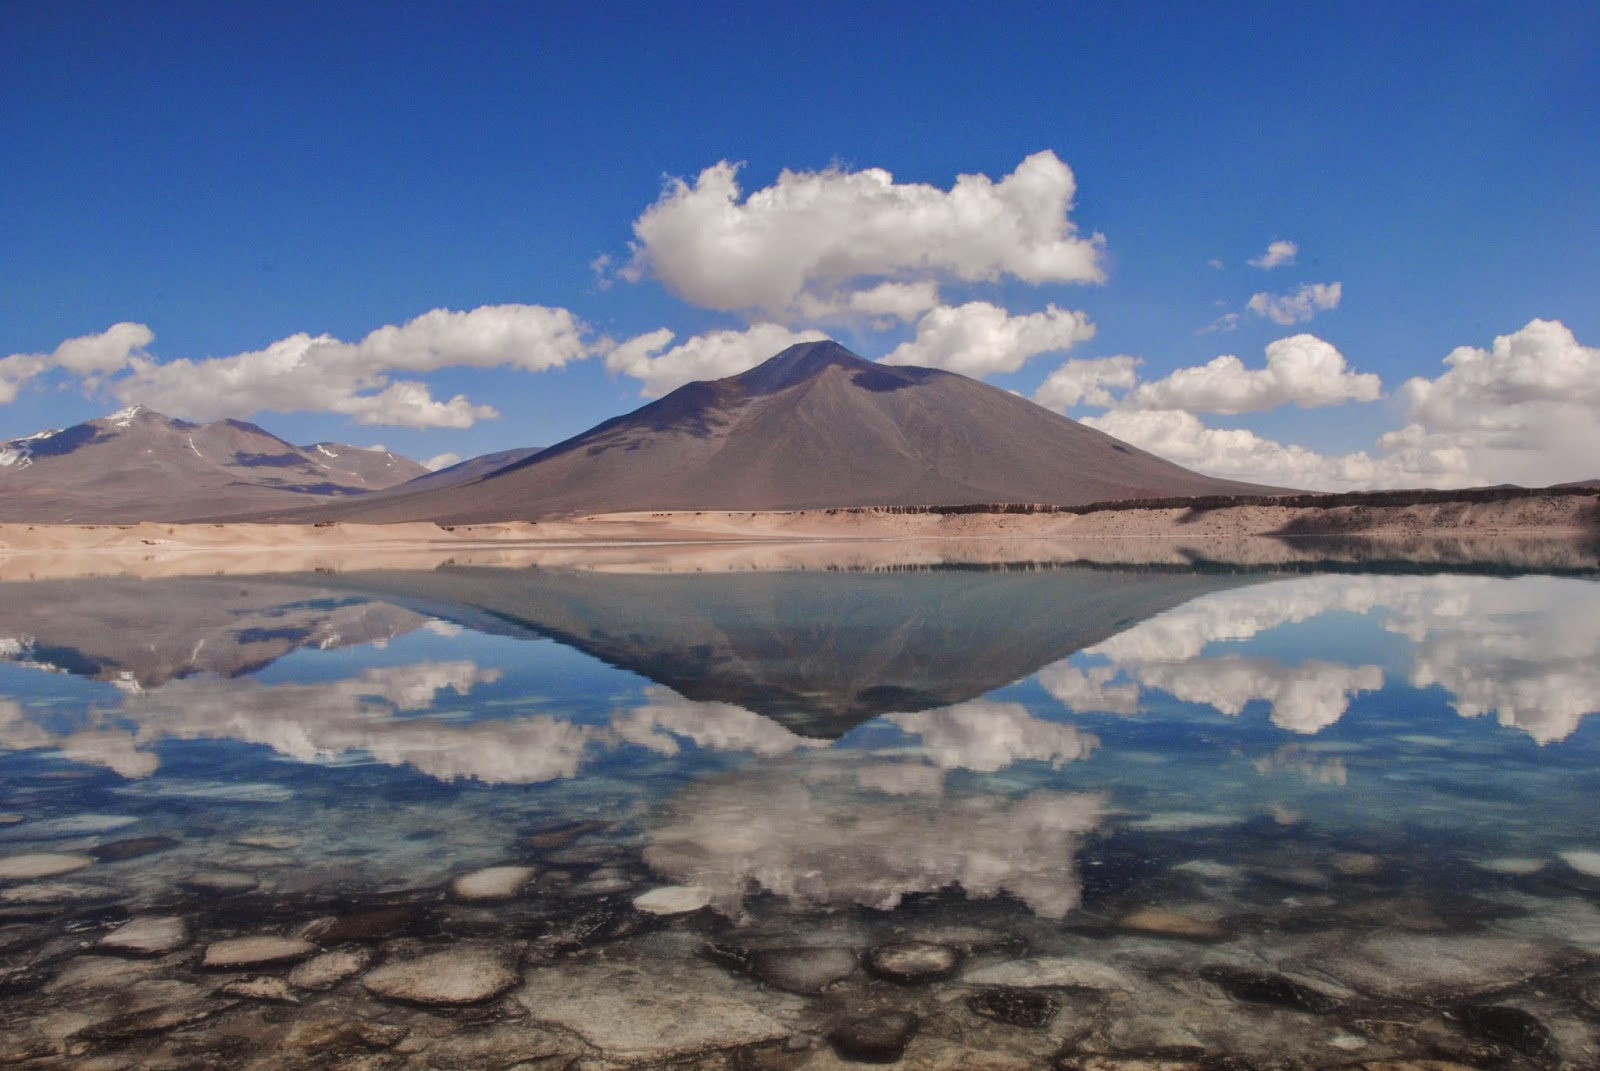 Laguna Verde, reflet du volcan Ojos del Salado - Chili